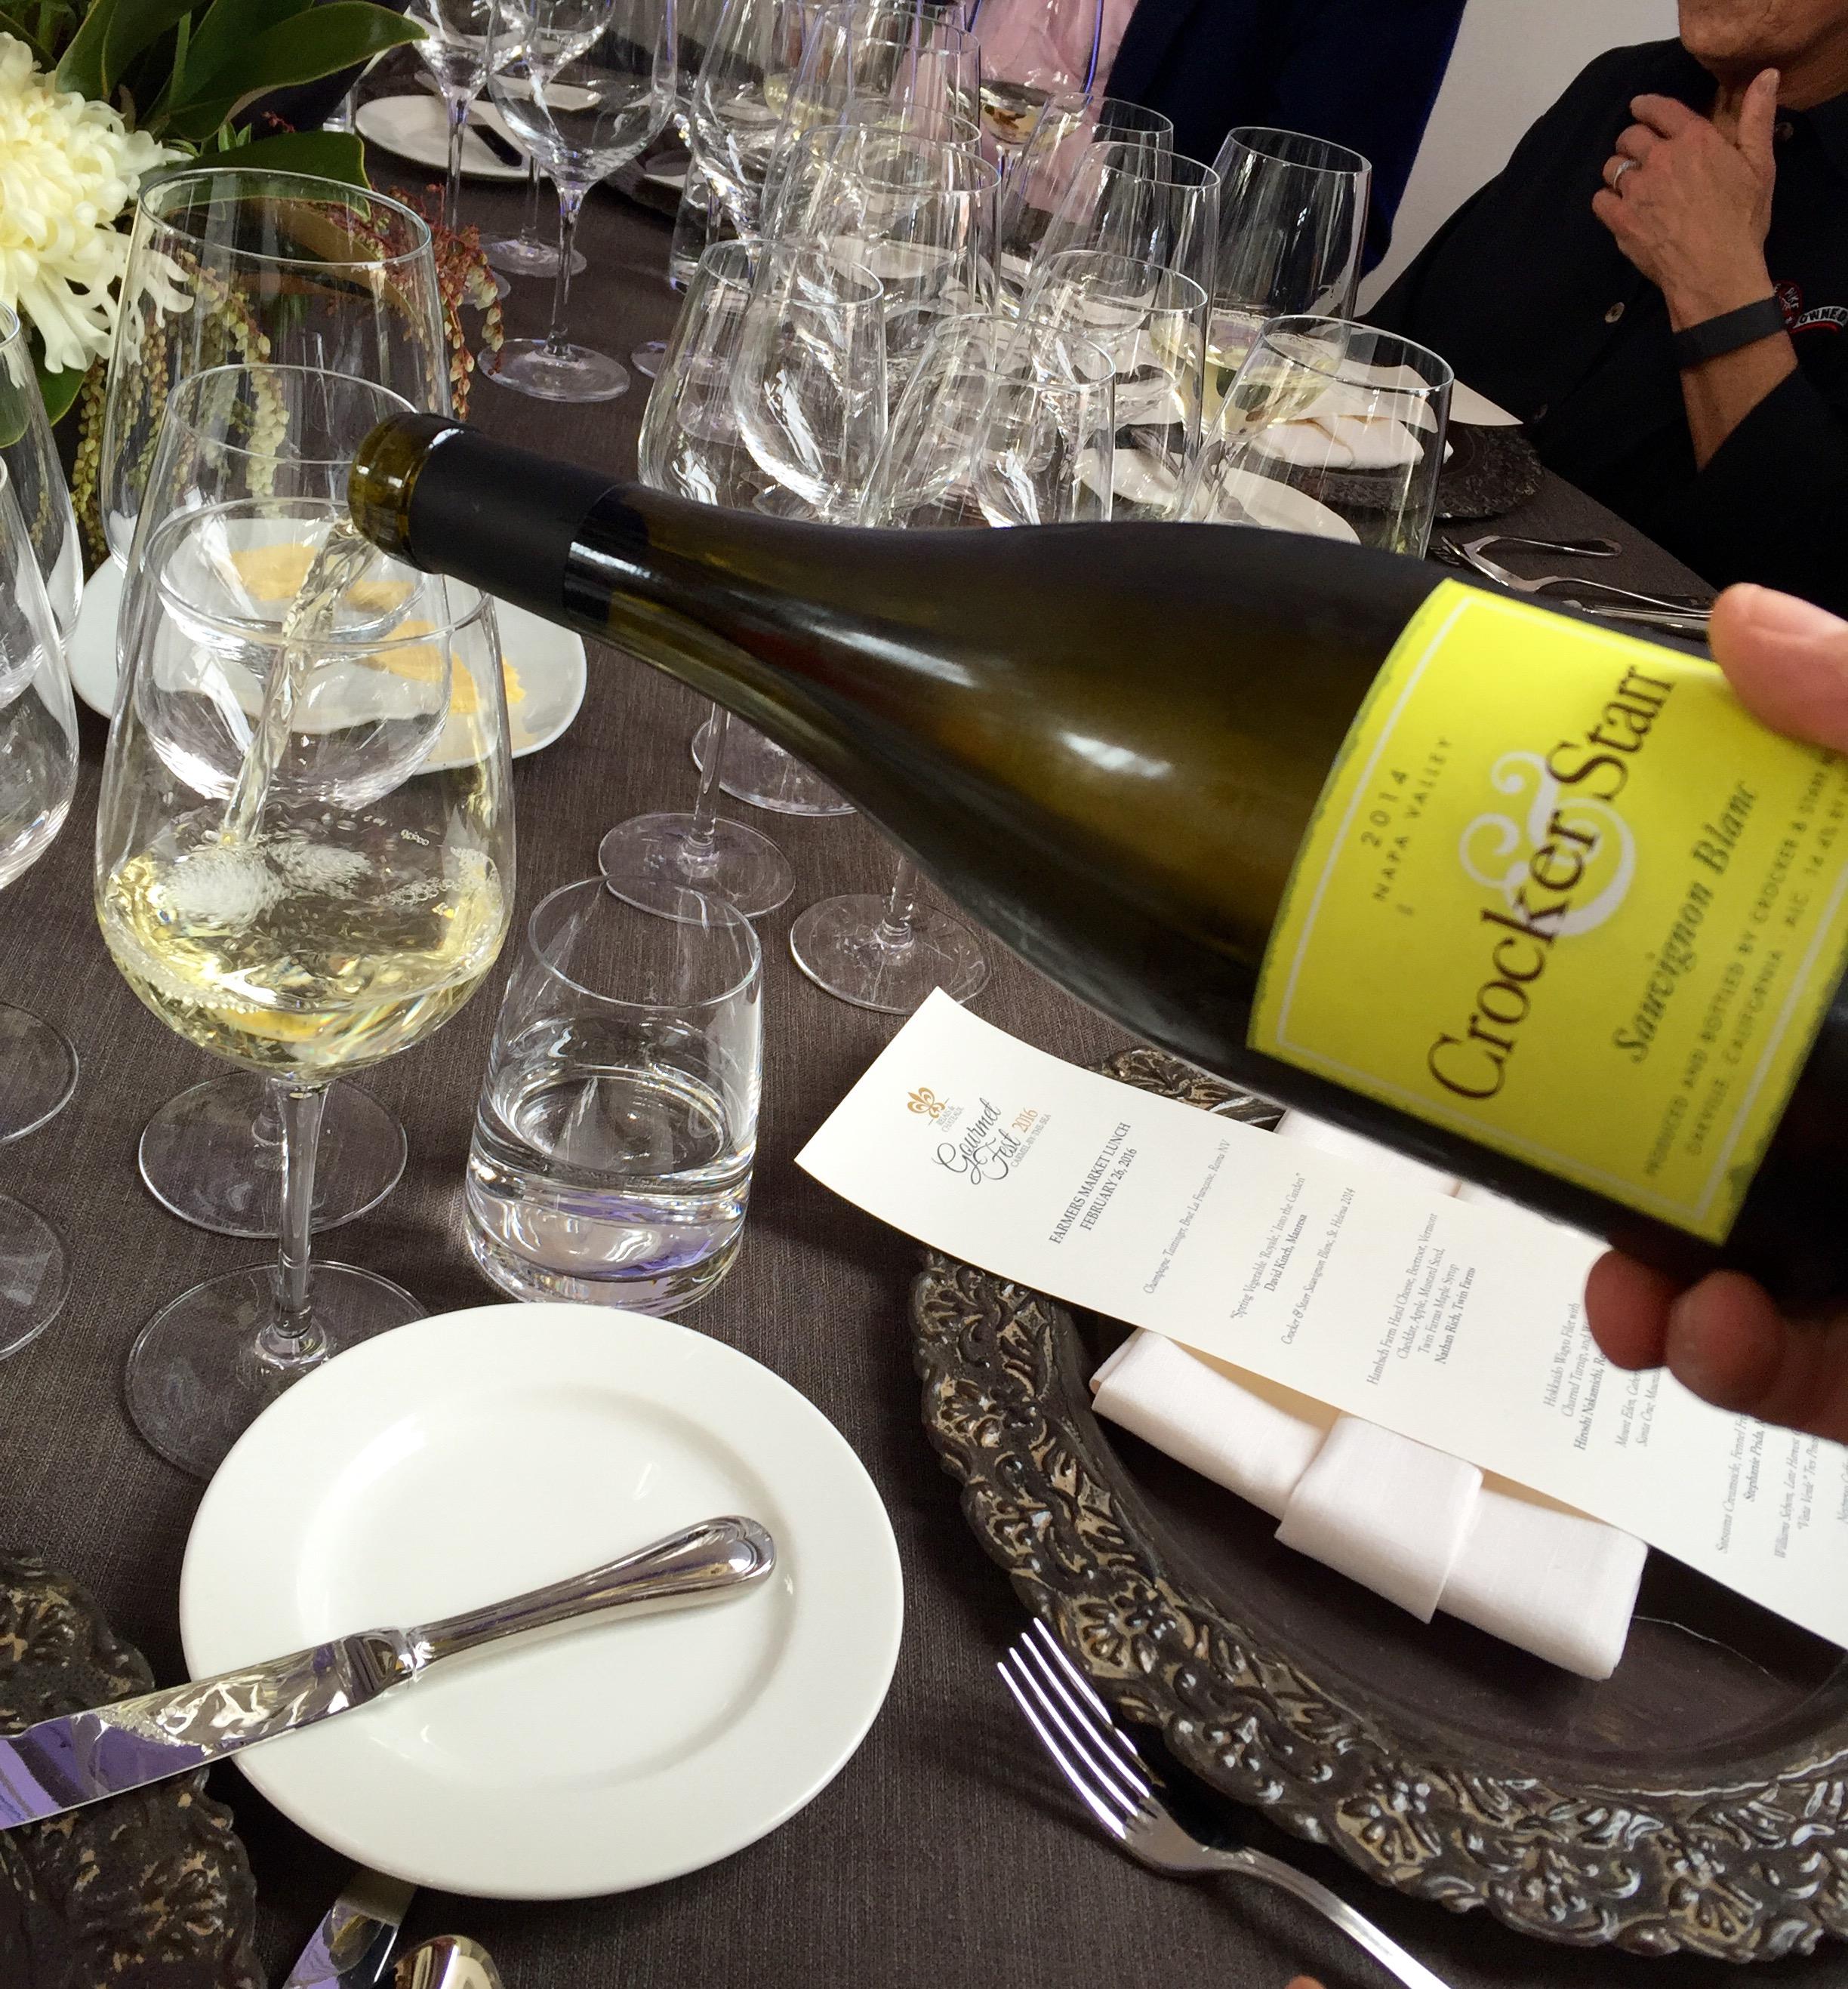 Crocker & Starr Sauvignon Blanc, St. Helena 2014